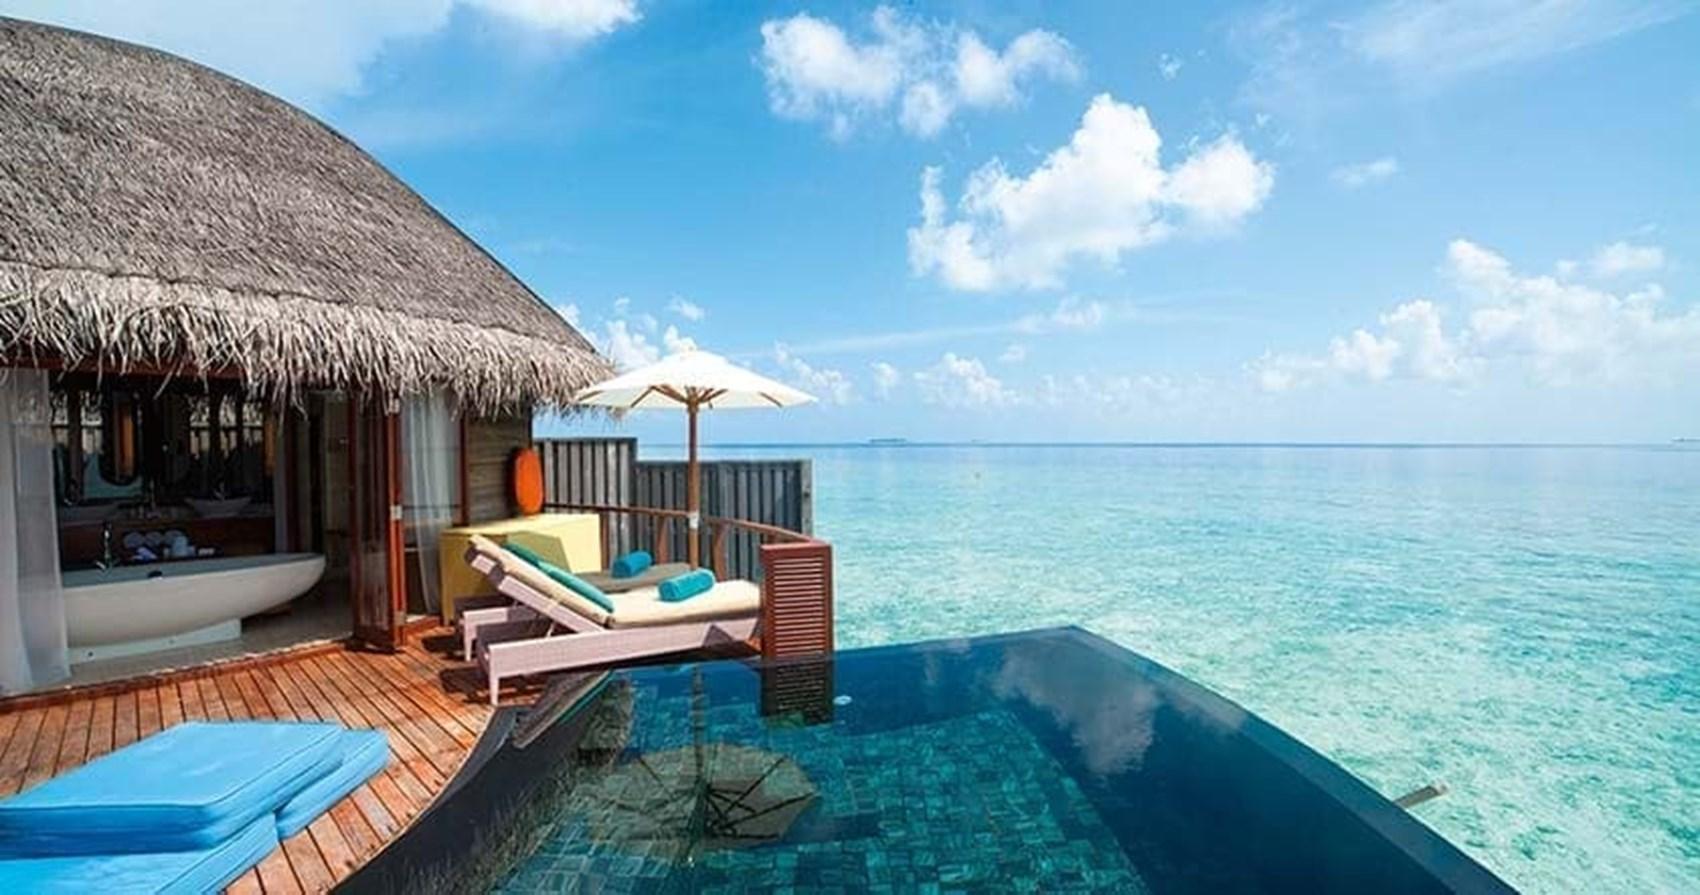 Constance halaveli maldives - The star shaped villa ...